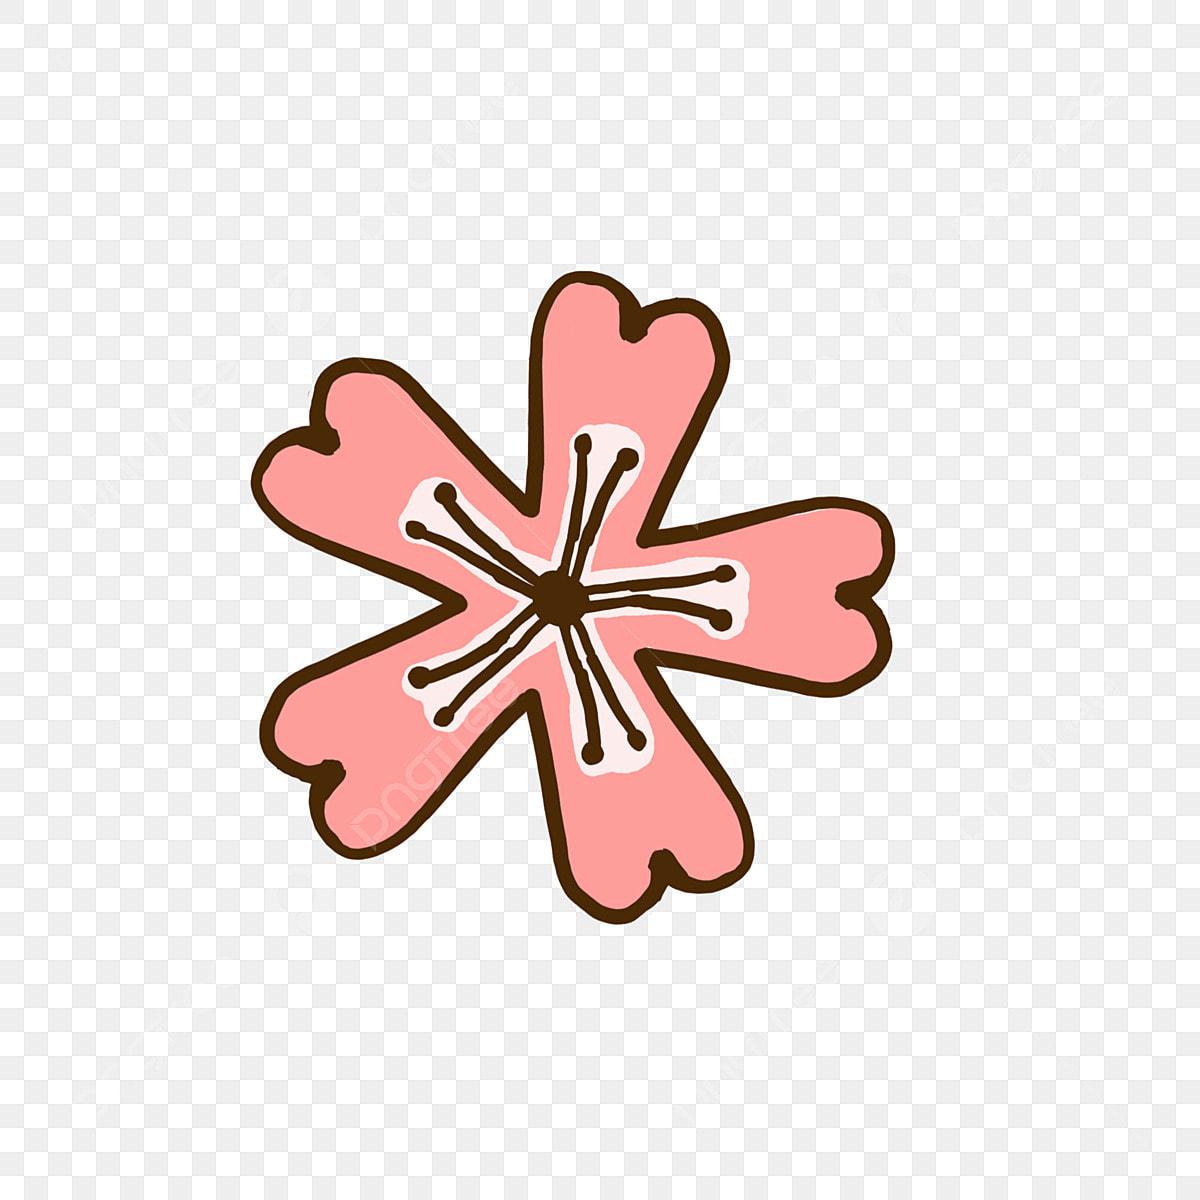 Peach Blossom Clip Art